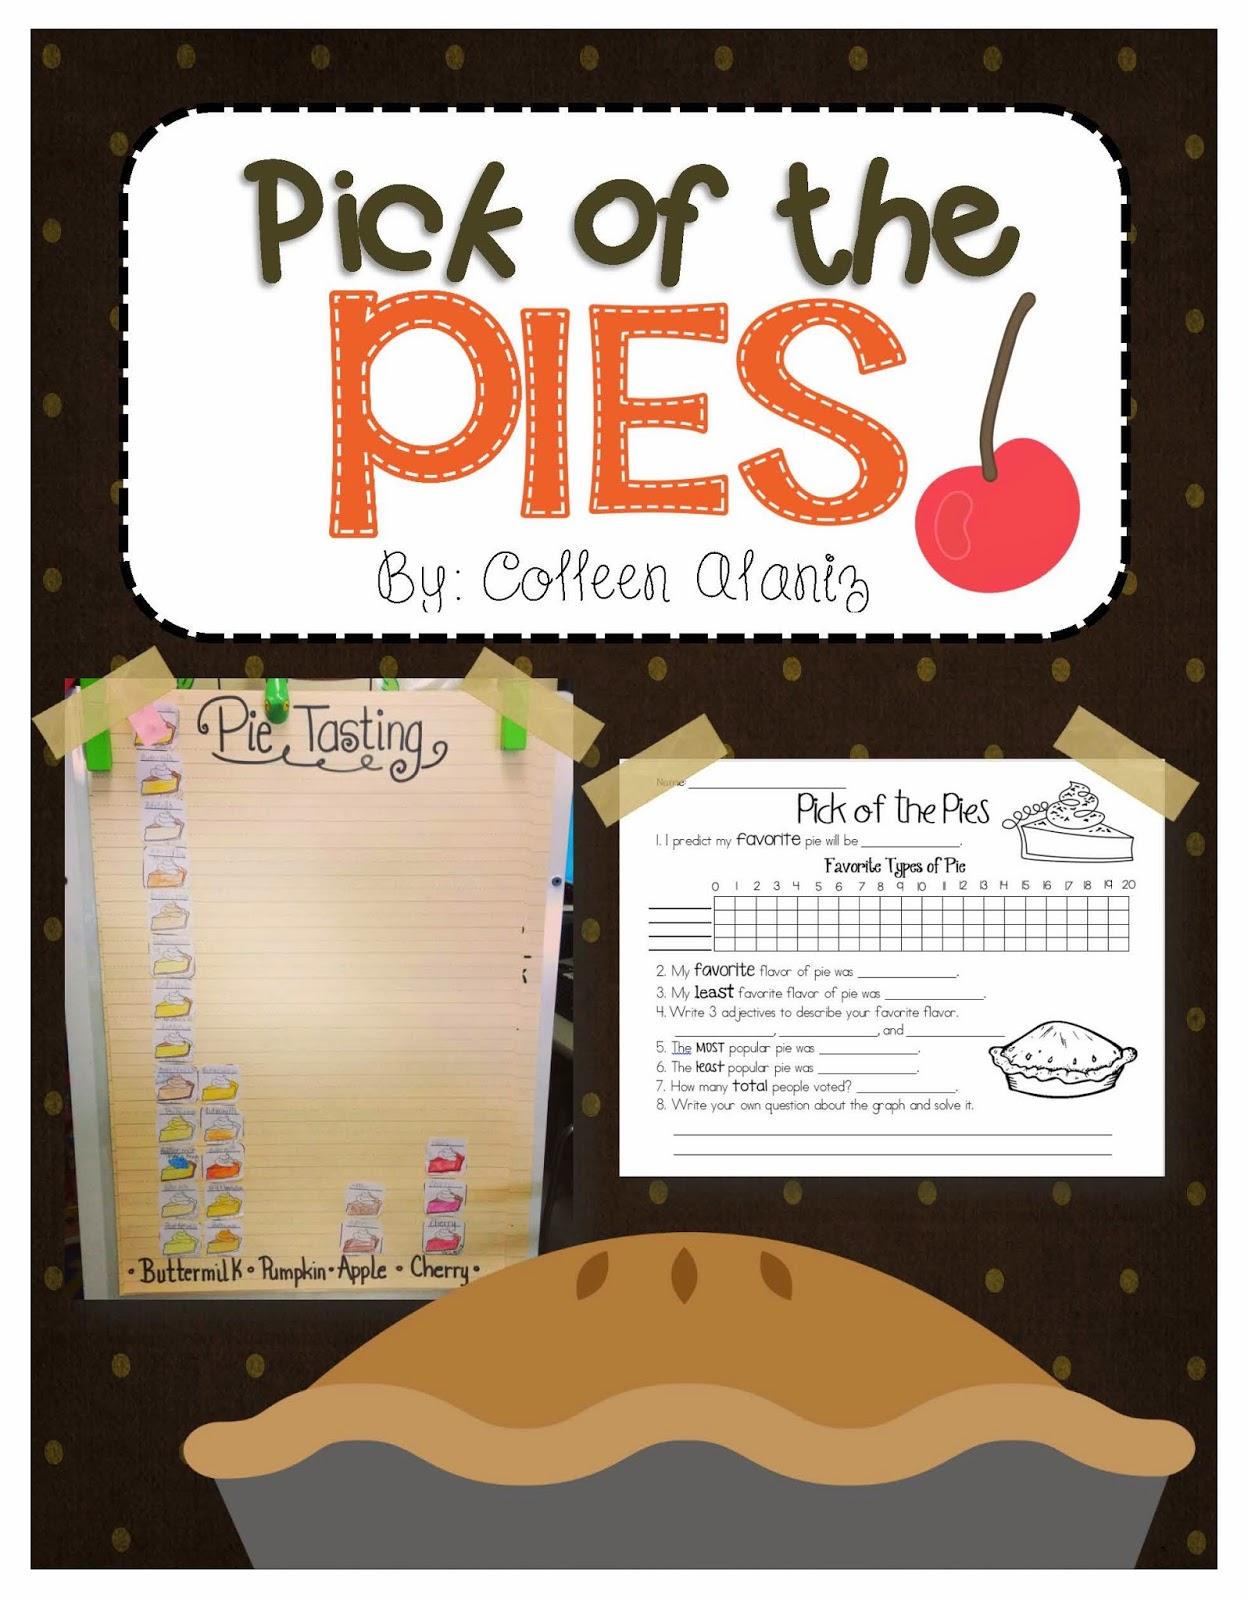 http://www.teacherspayteachers.com/Product/Pick-of-the-Pies-1575117